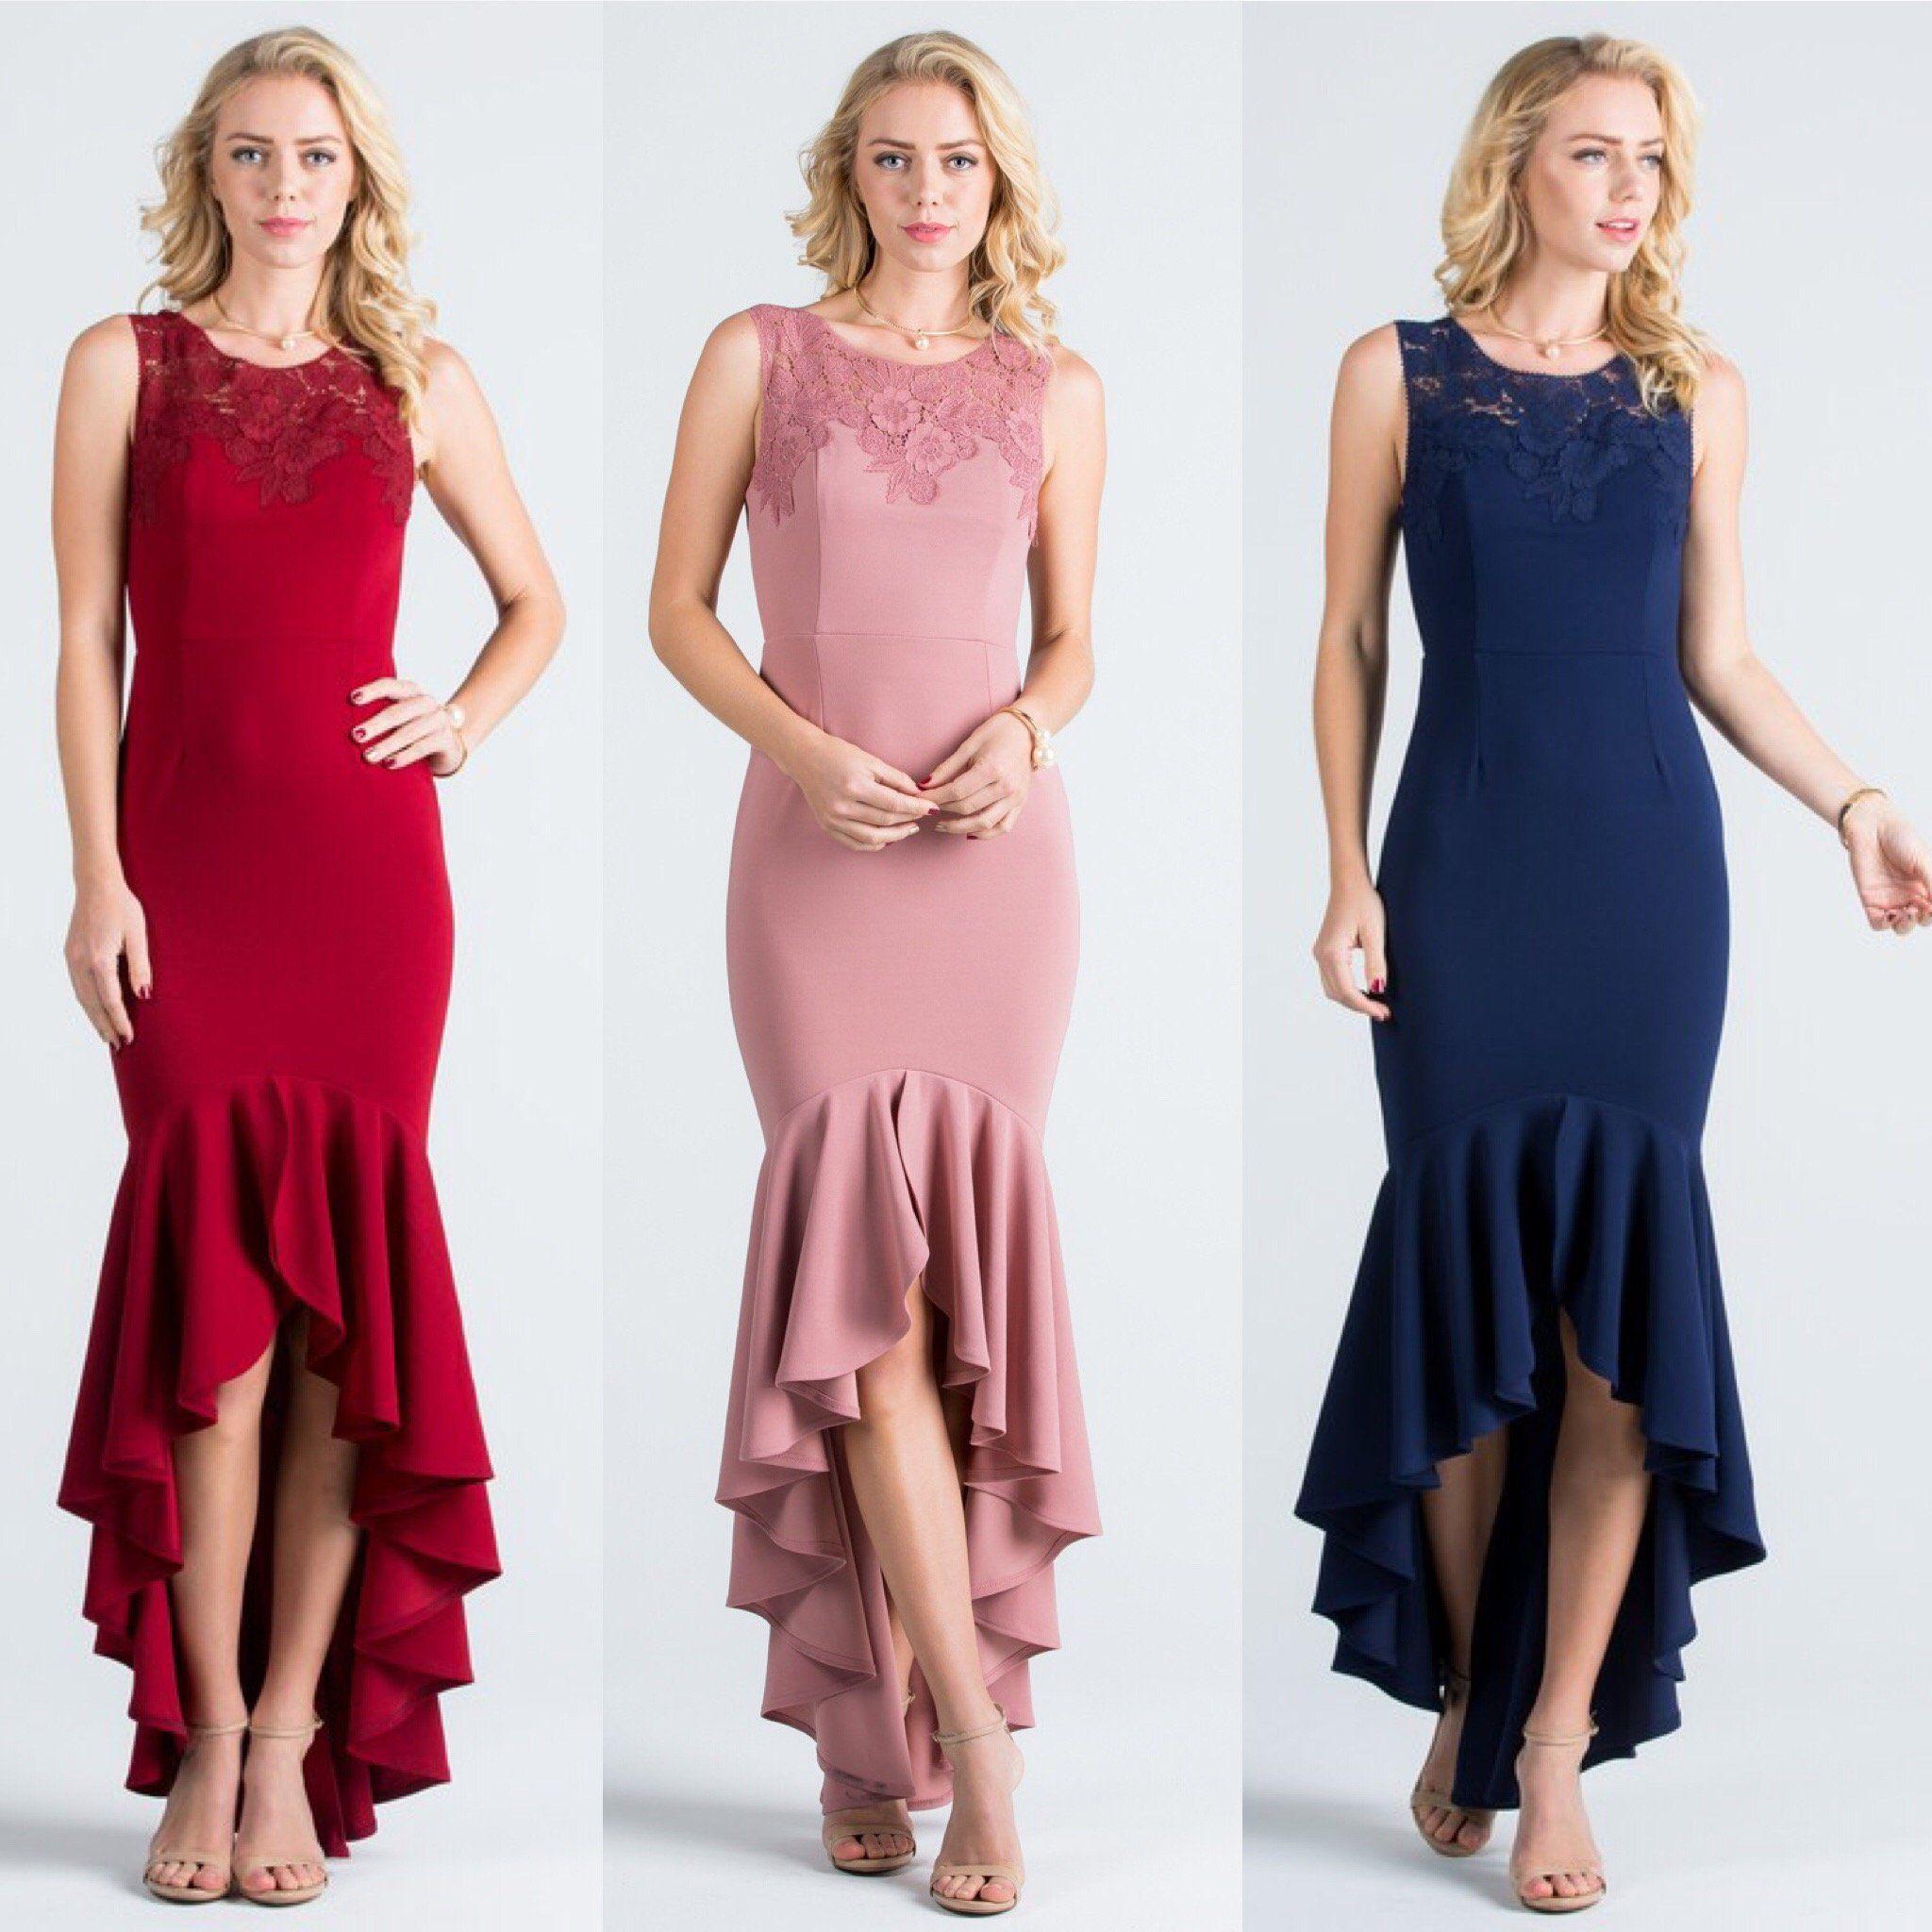 Ella Affordable High low mermaid bridesmaid dress in Navy, Burgundy ...